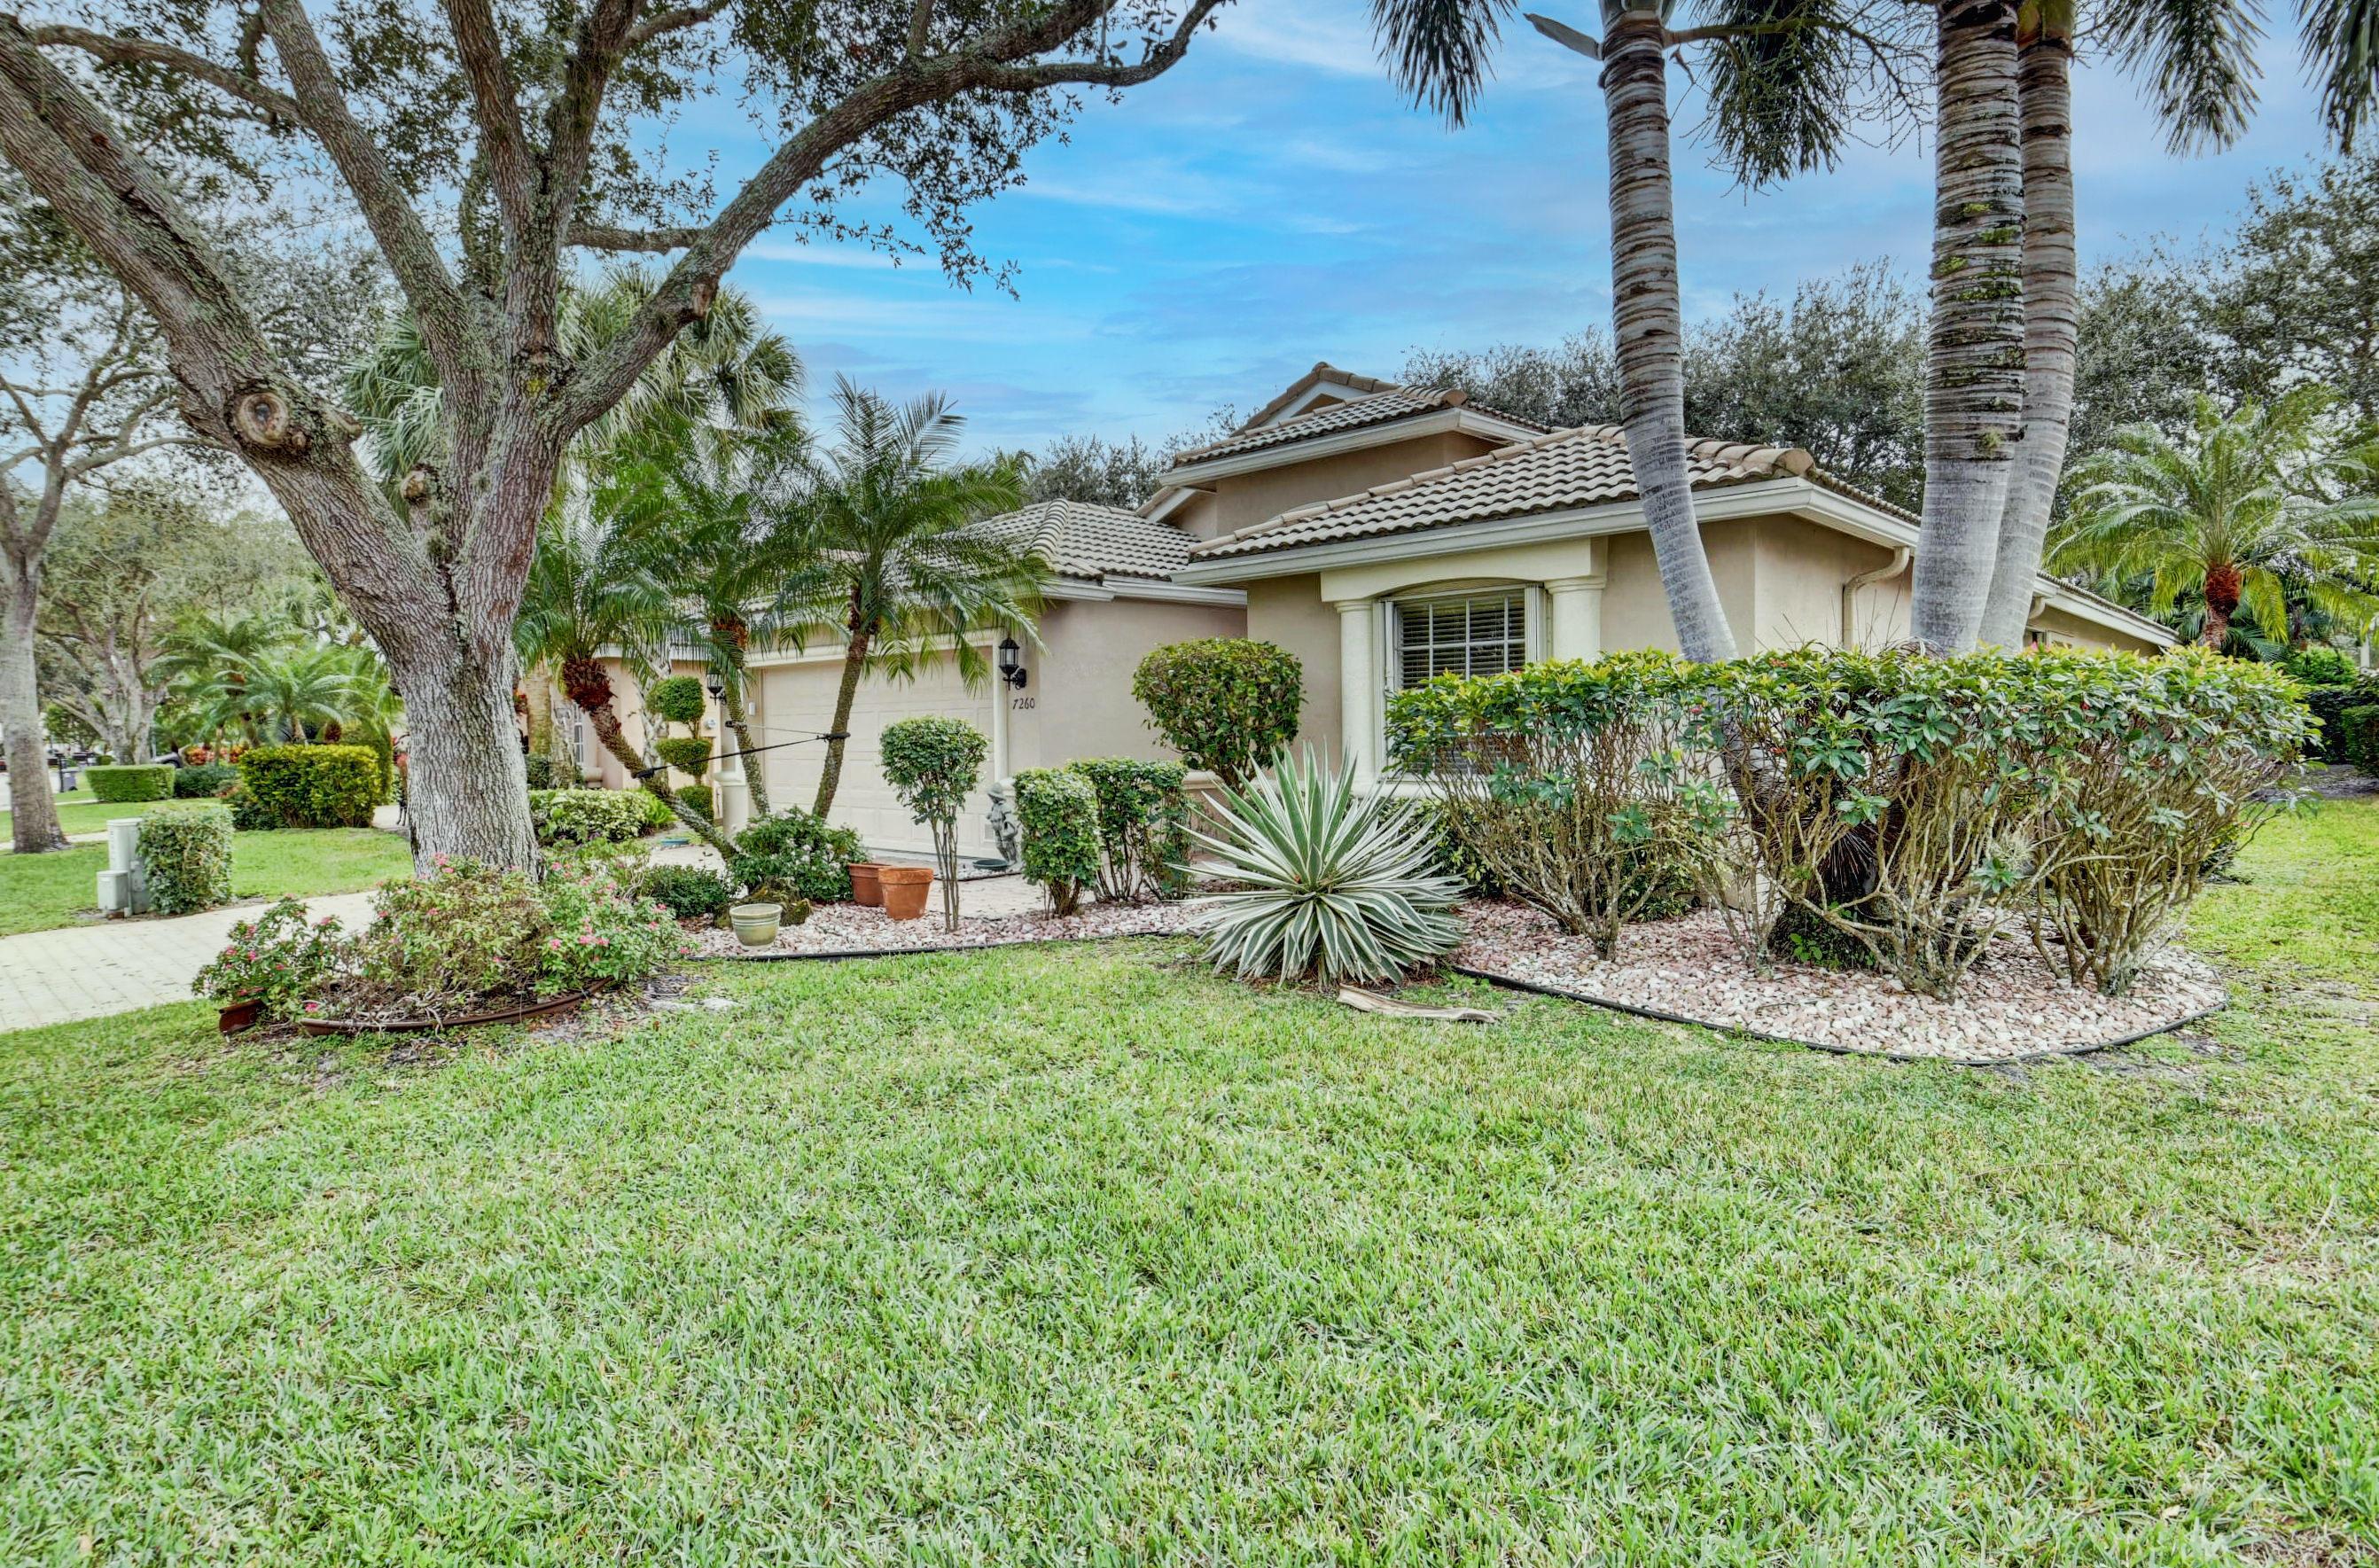 Home for sale in Villa Borgheses Delray Beach Florida